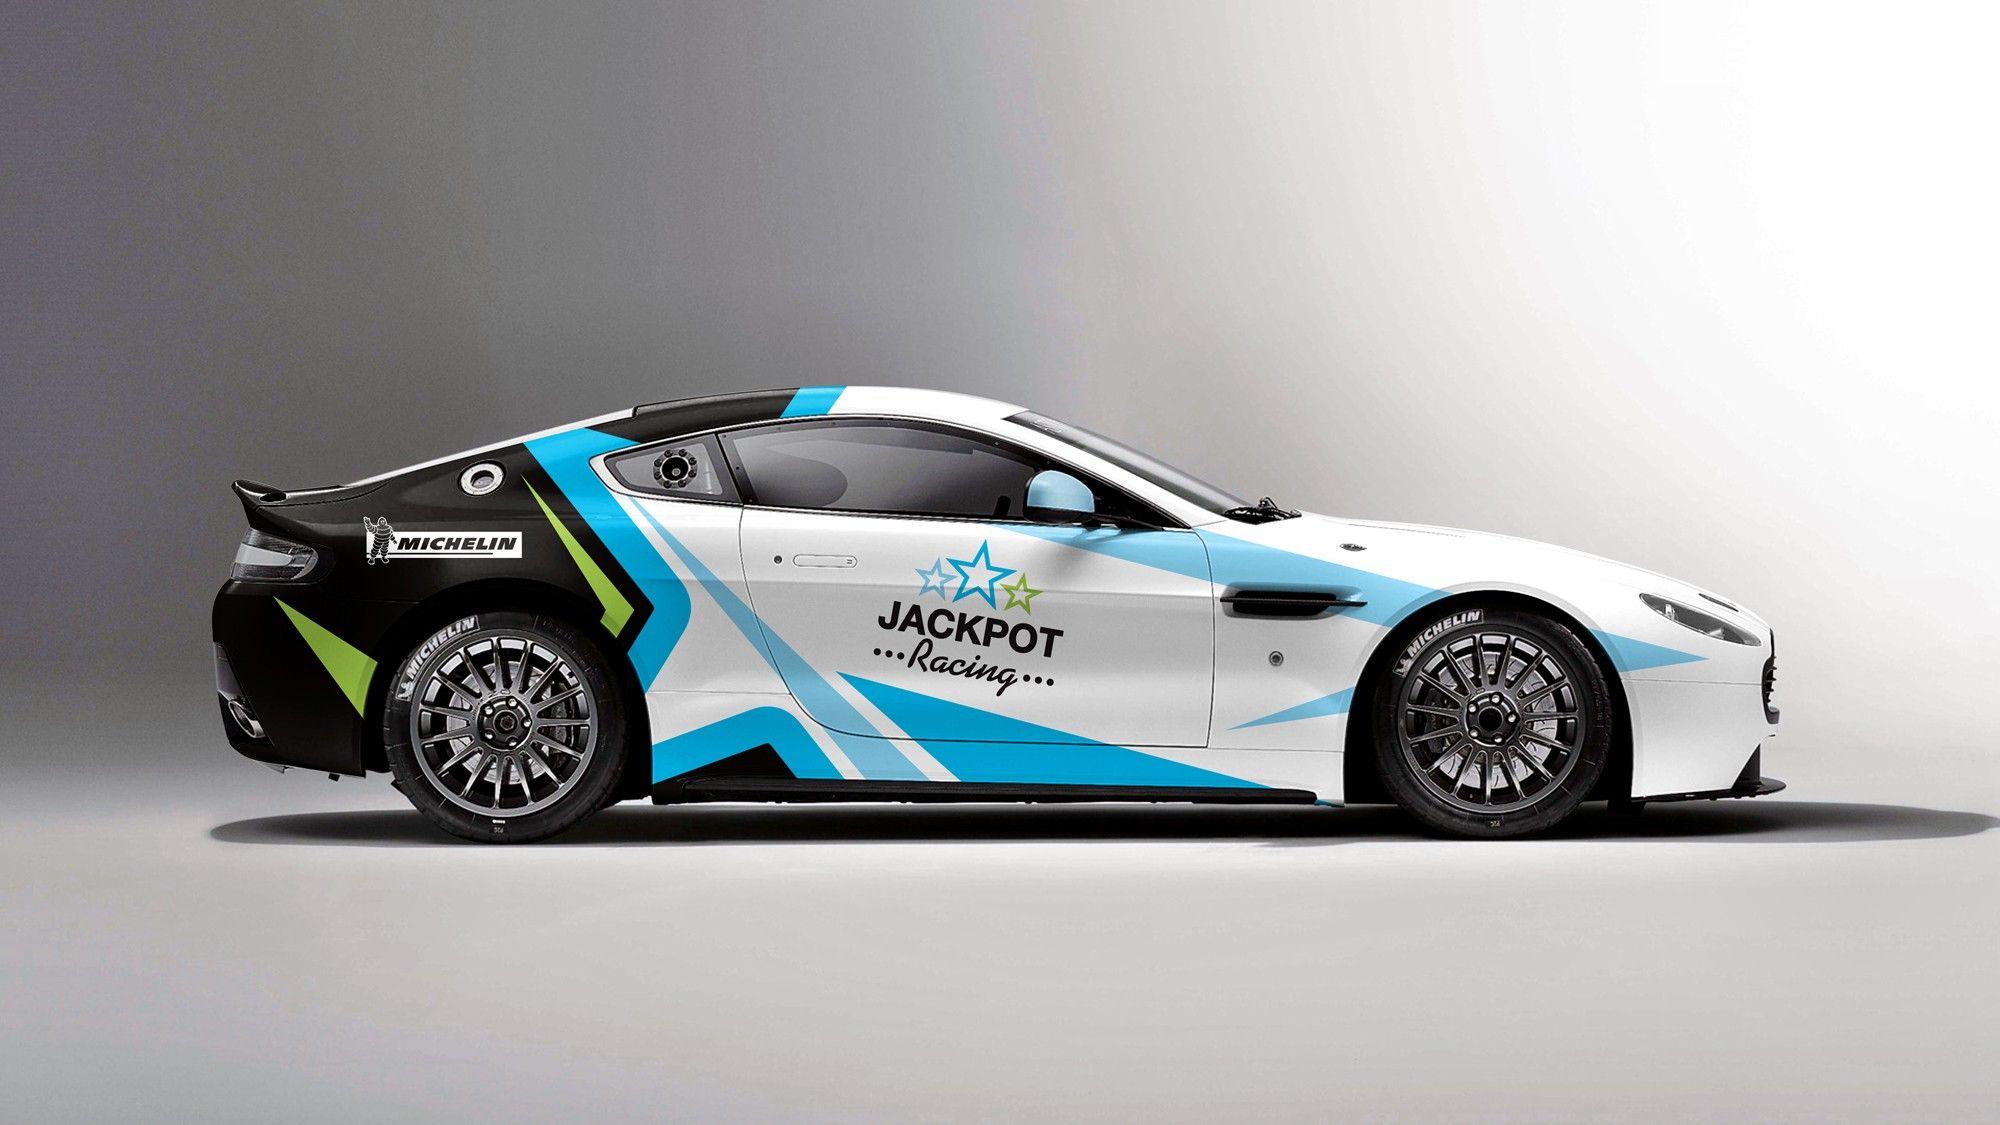 Auto • Aston Martin, Jackpot Racing   Car wrap designs   Pinterest ...